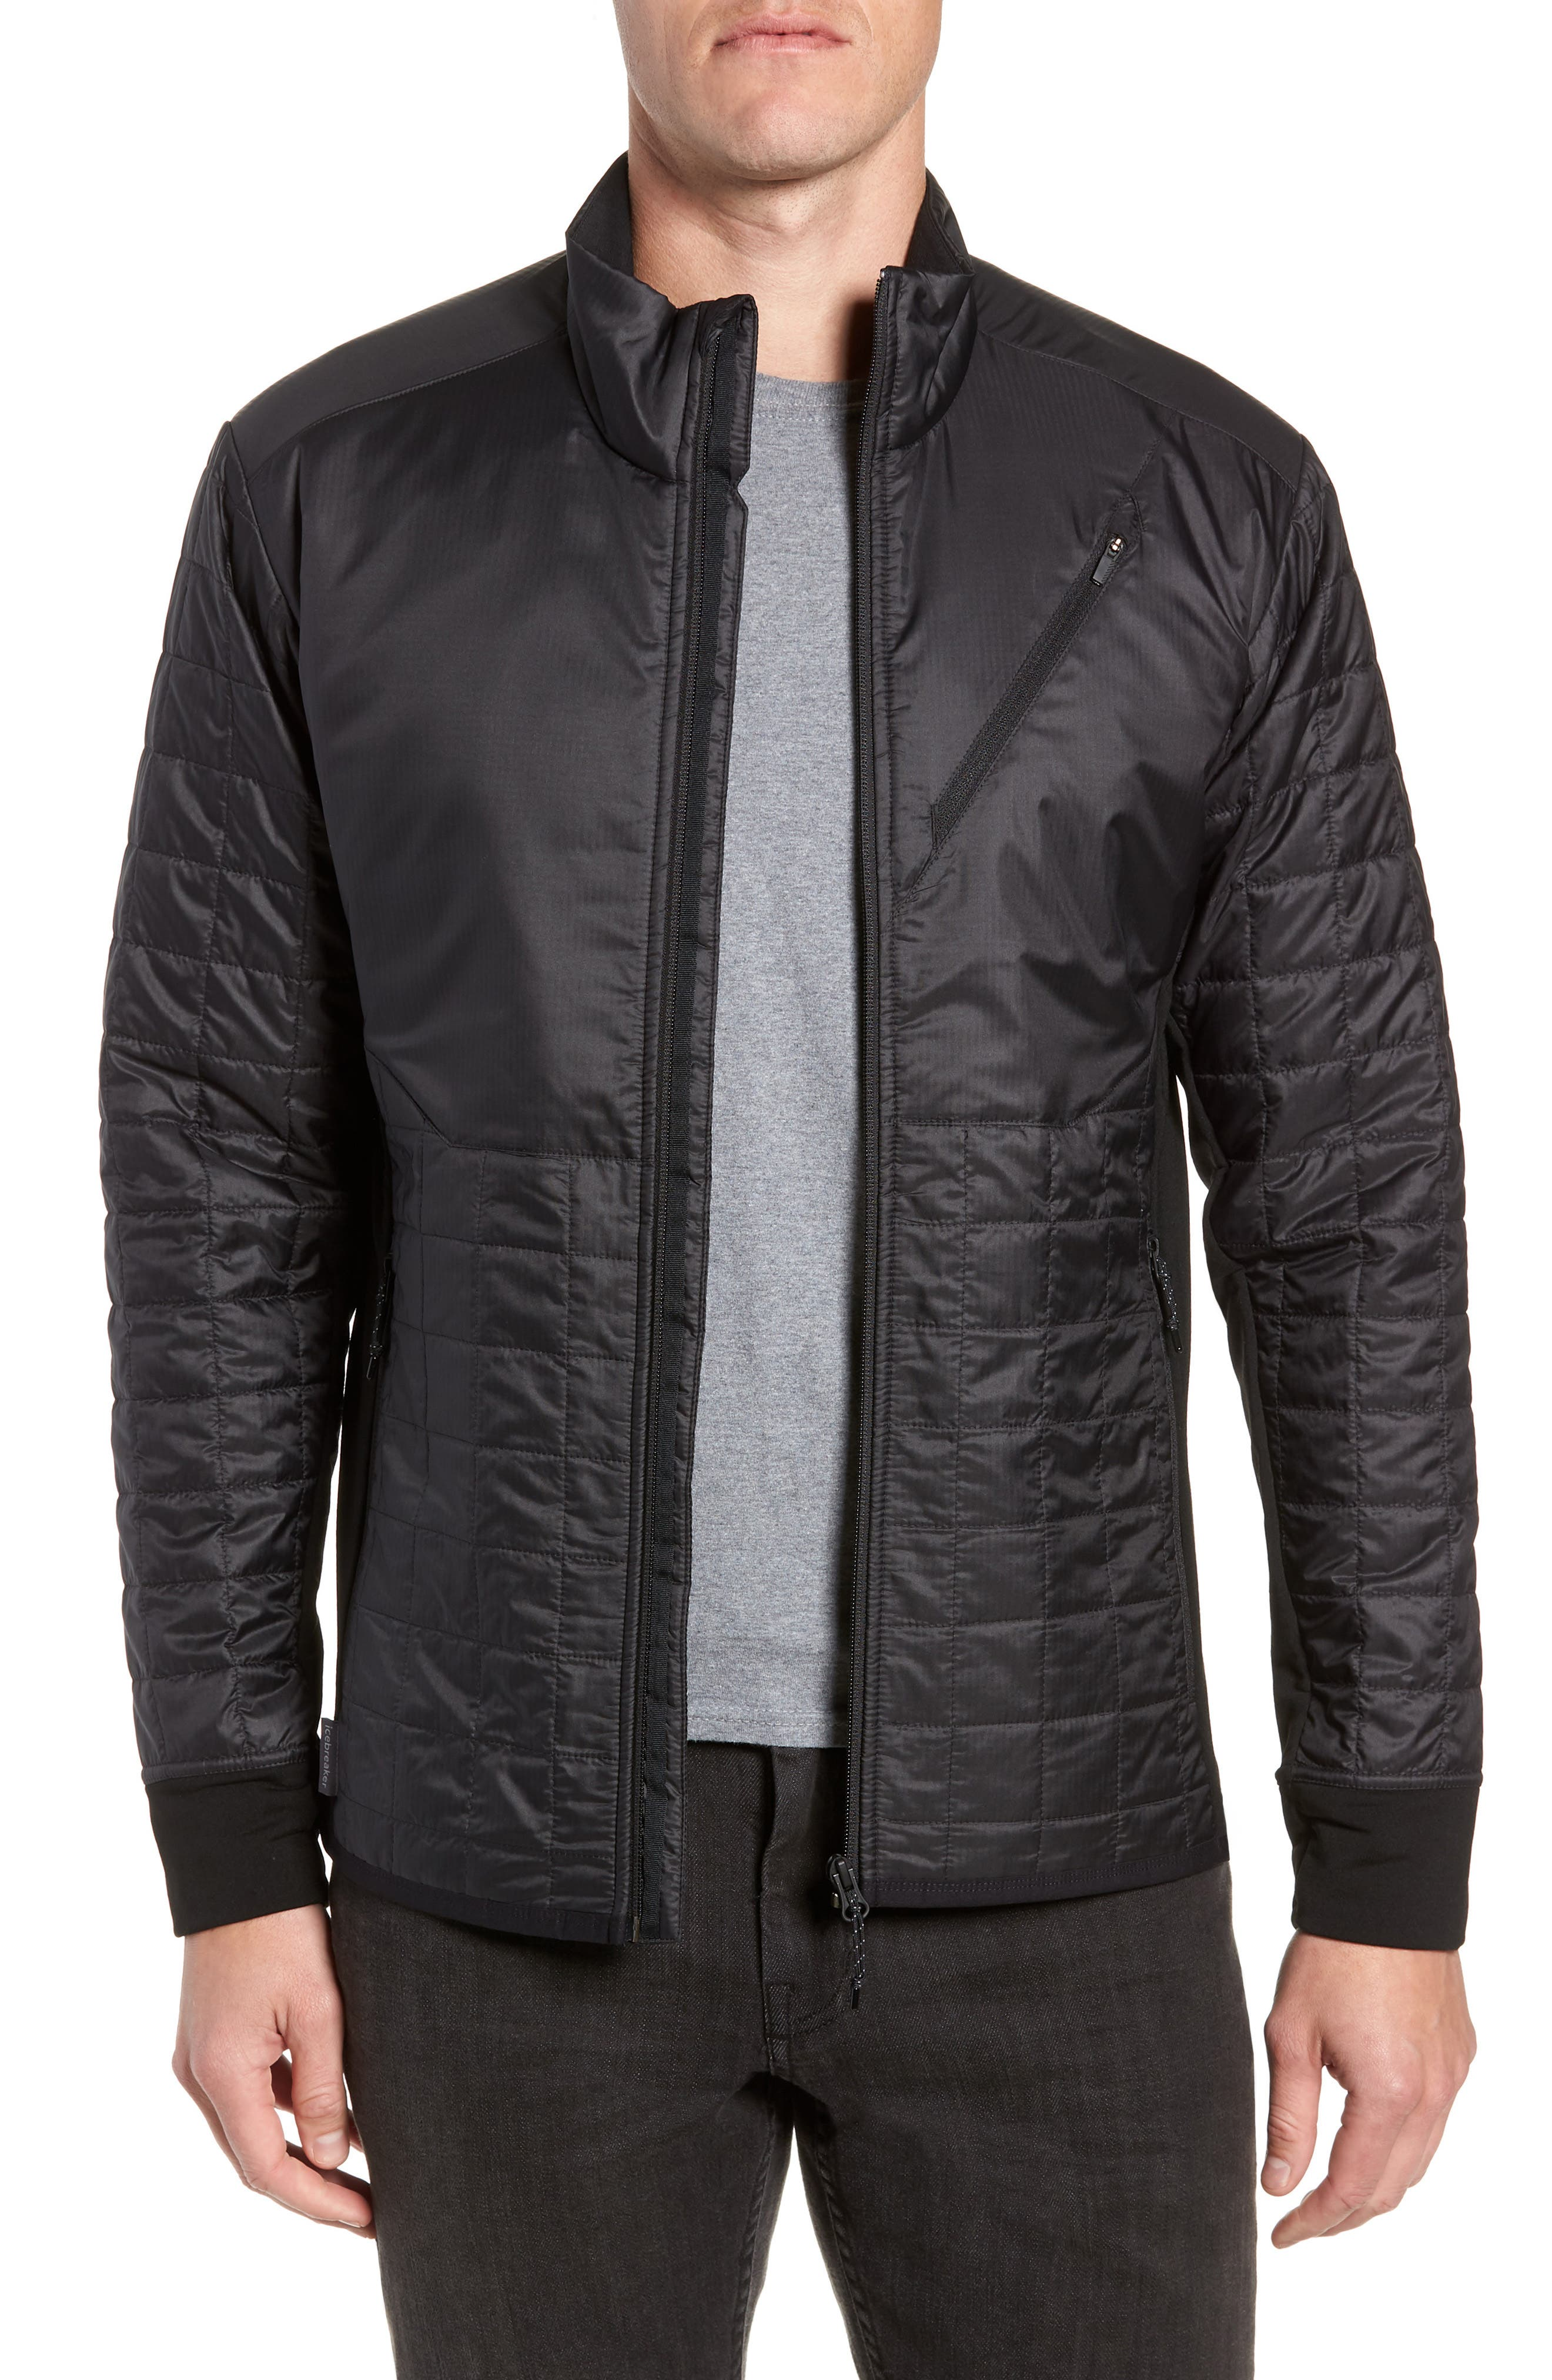 MerinoLOFT<sup>™</sup> Helix Midlayer Zip Jacket,                             Main thumbnail 1, color,                             BLACK/ JET HEATHER